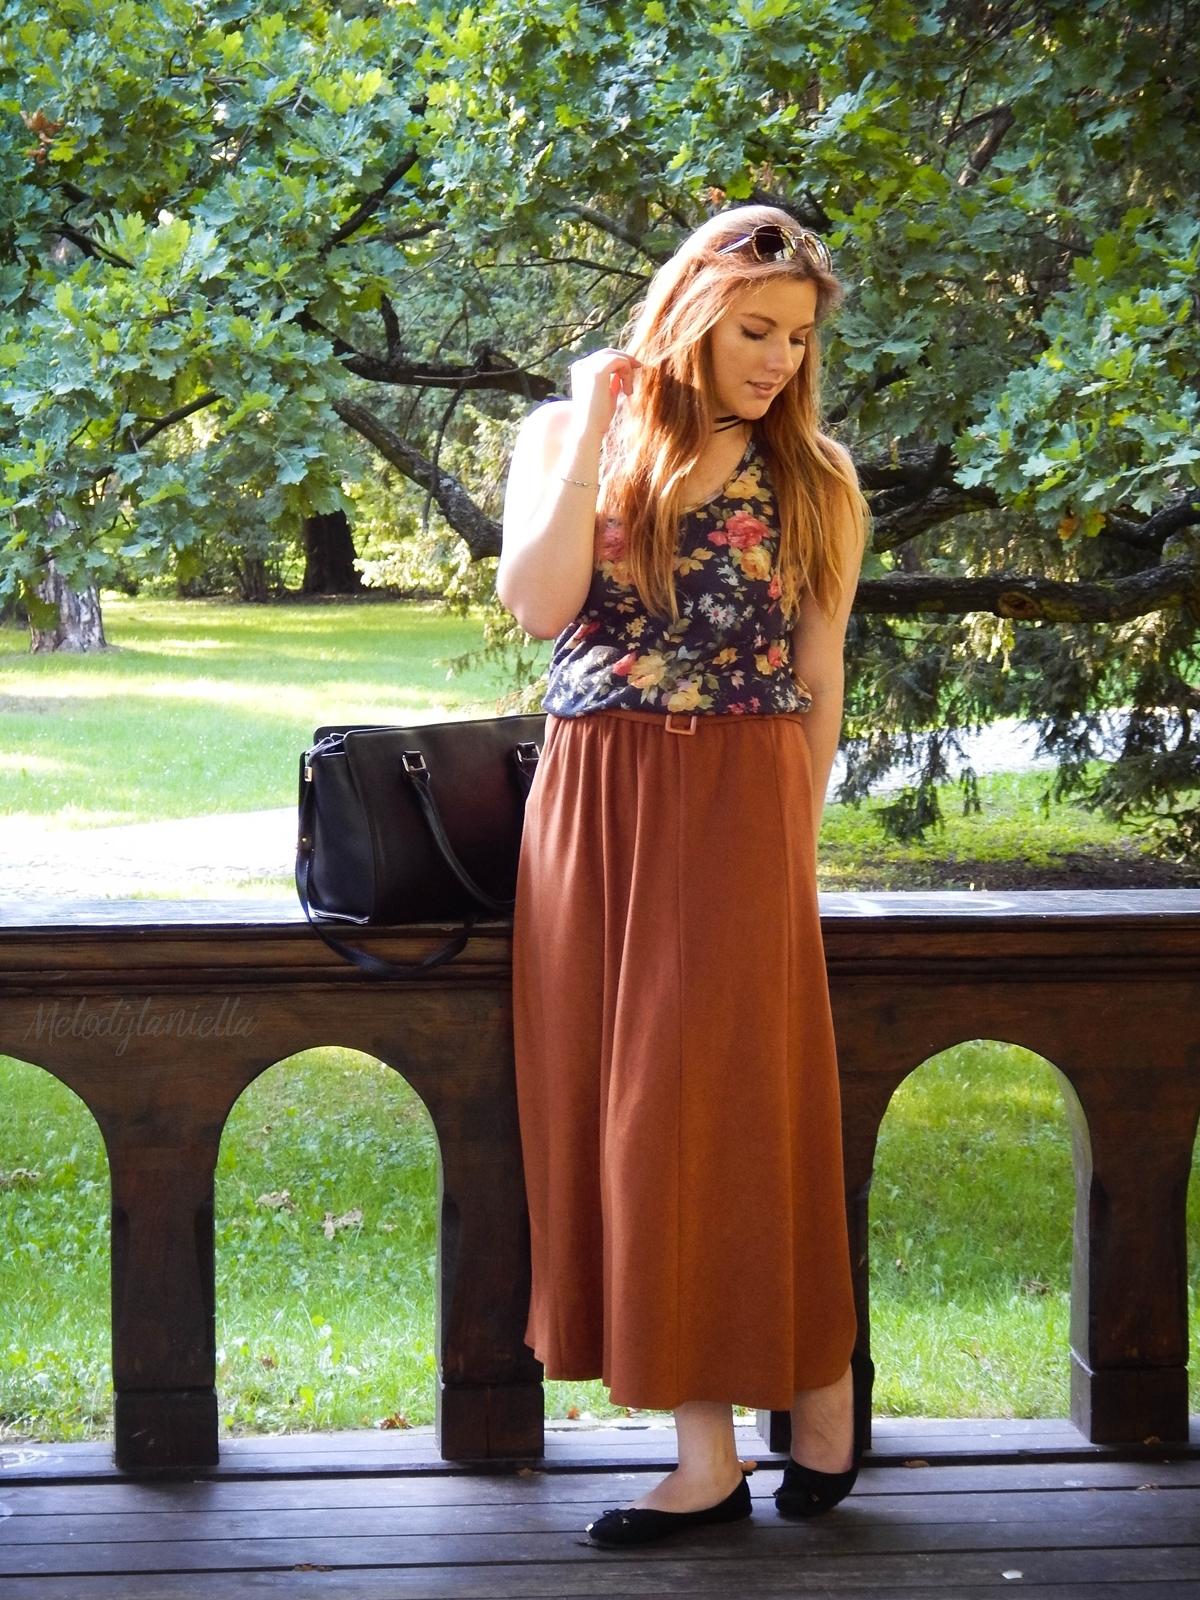 ruda spodnica mamy kolorowy top river islands czarna torebka manzana lookbook na jesien baletki